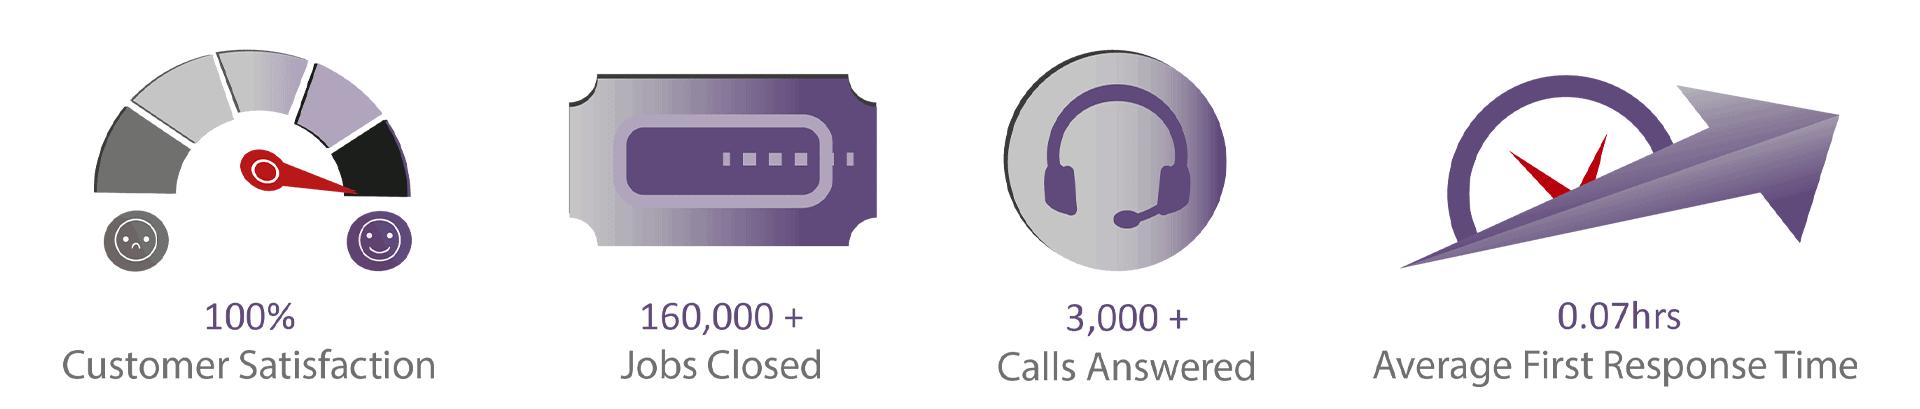 Customer-Survey-Summary